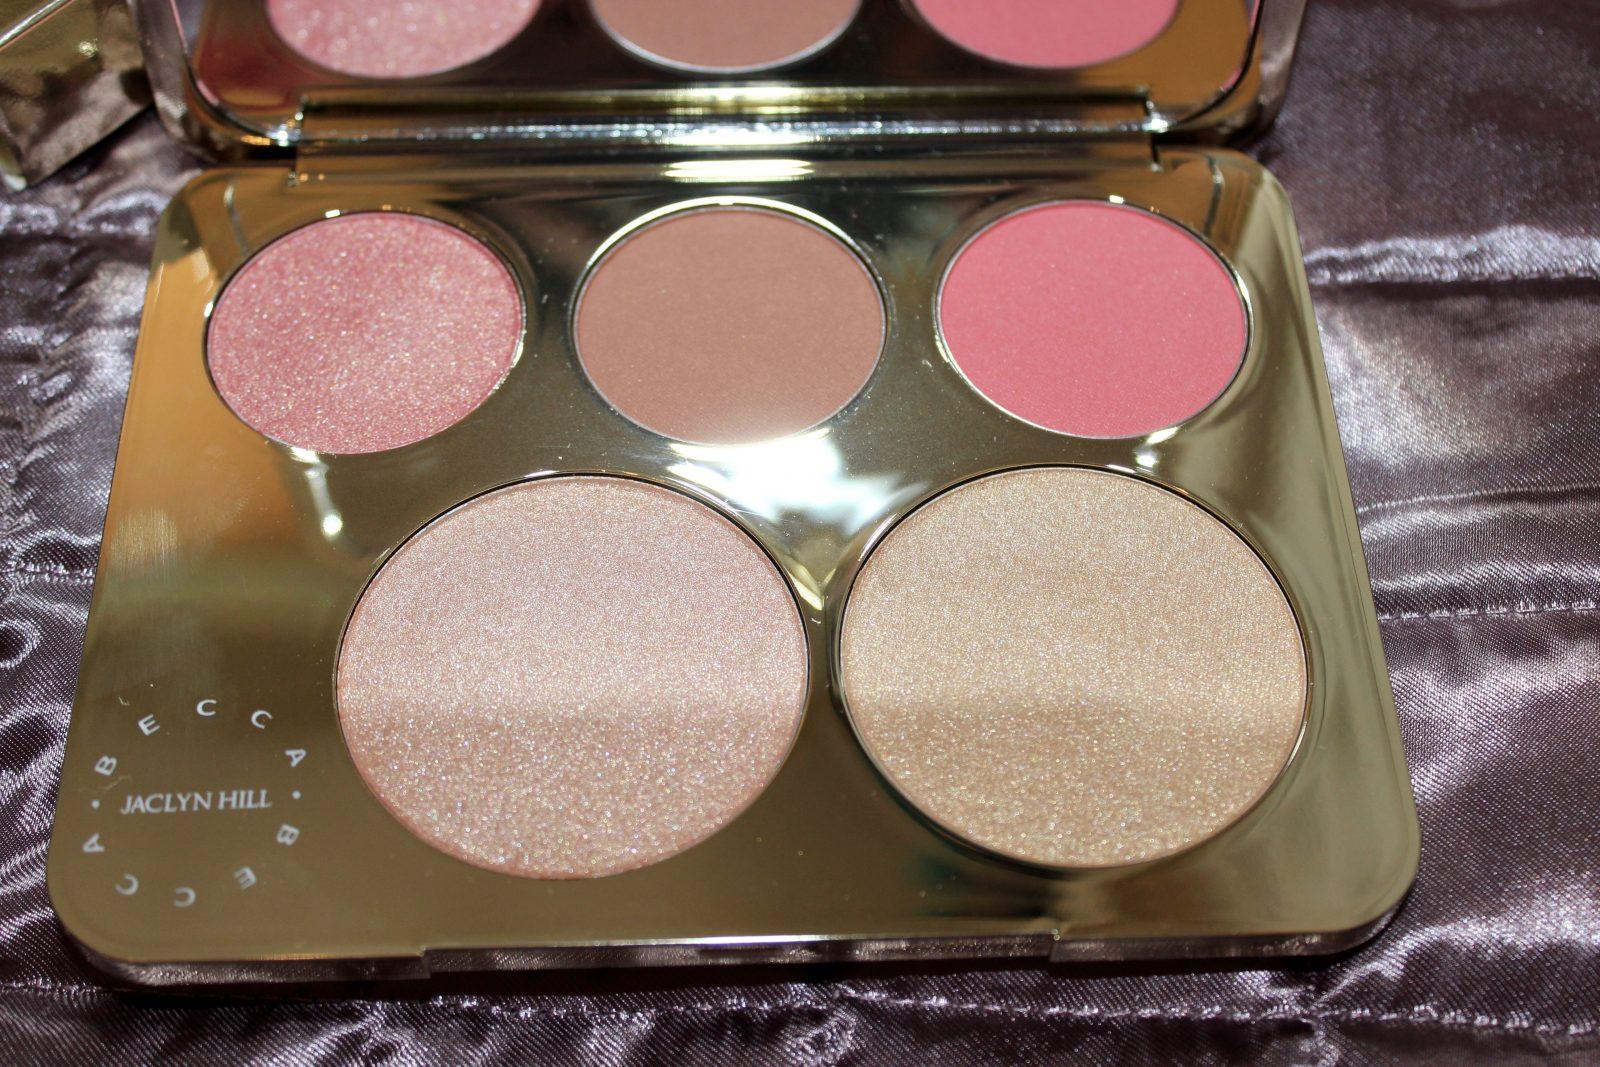 Becca Cosmetics Ireland